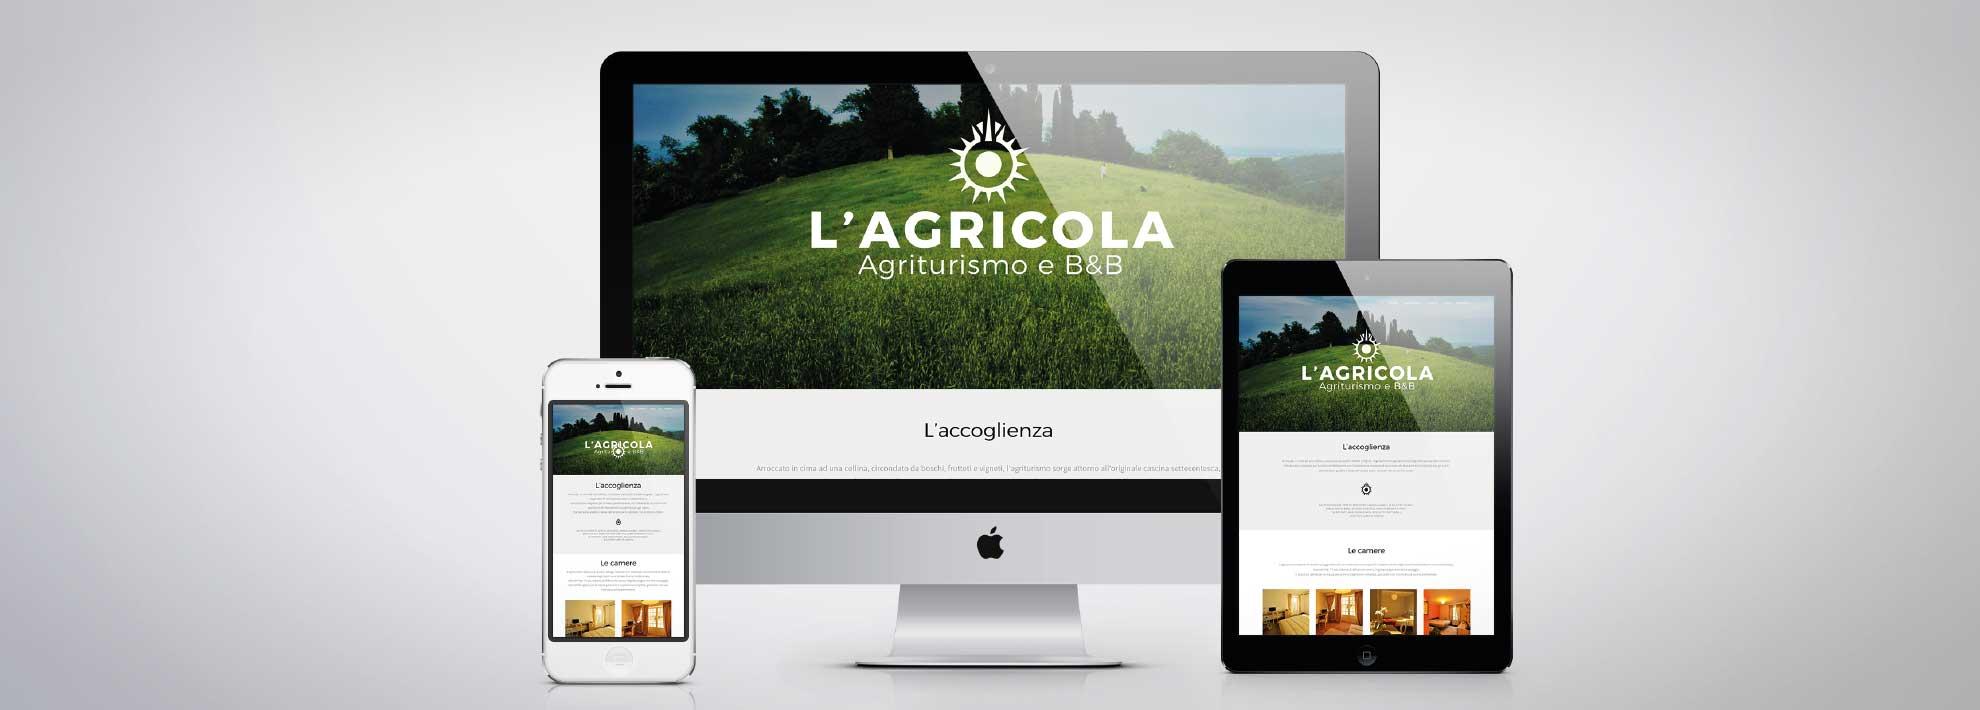 Cromomedia: webagency Torino